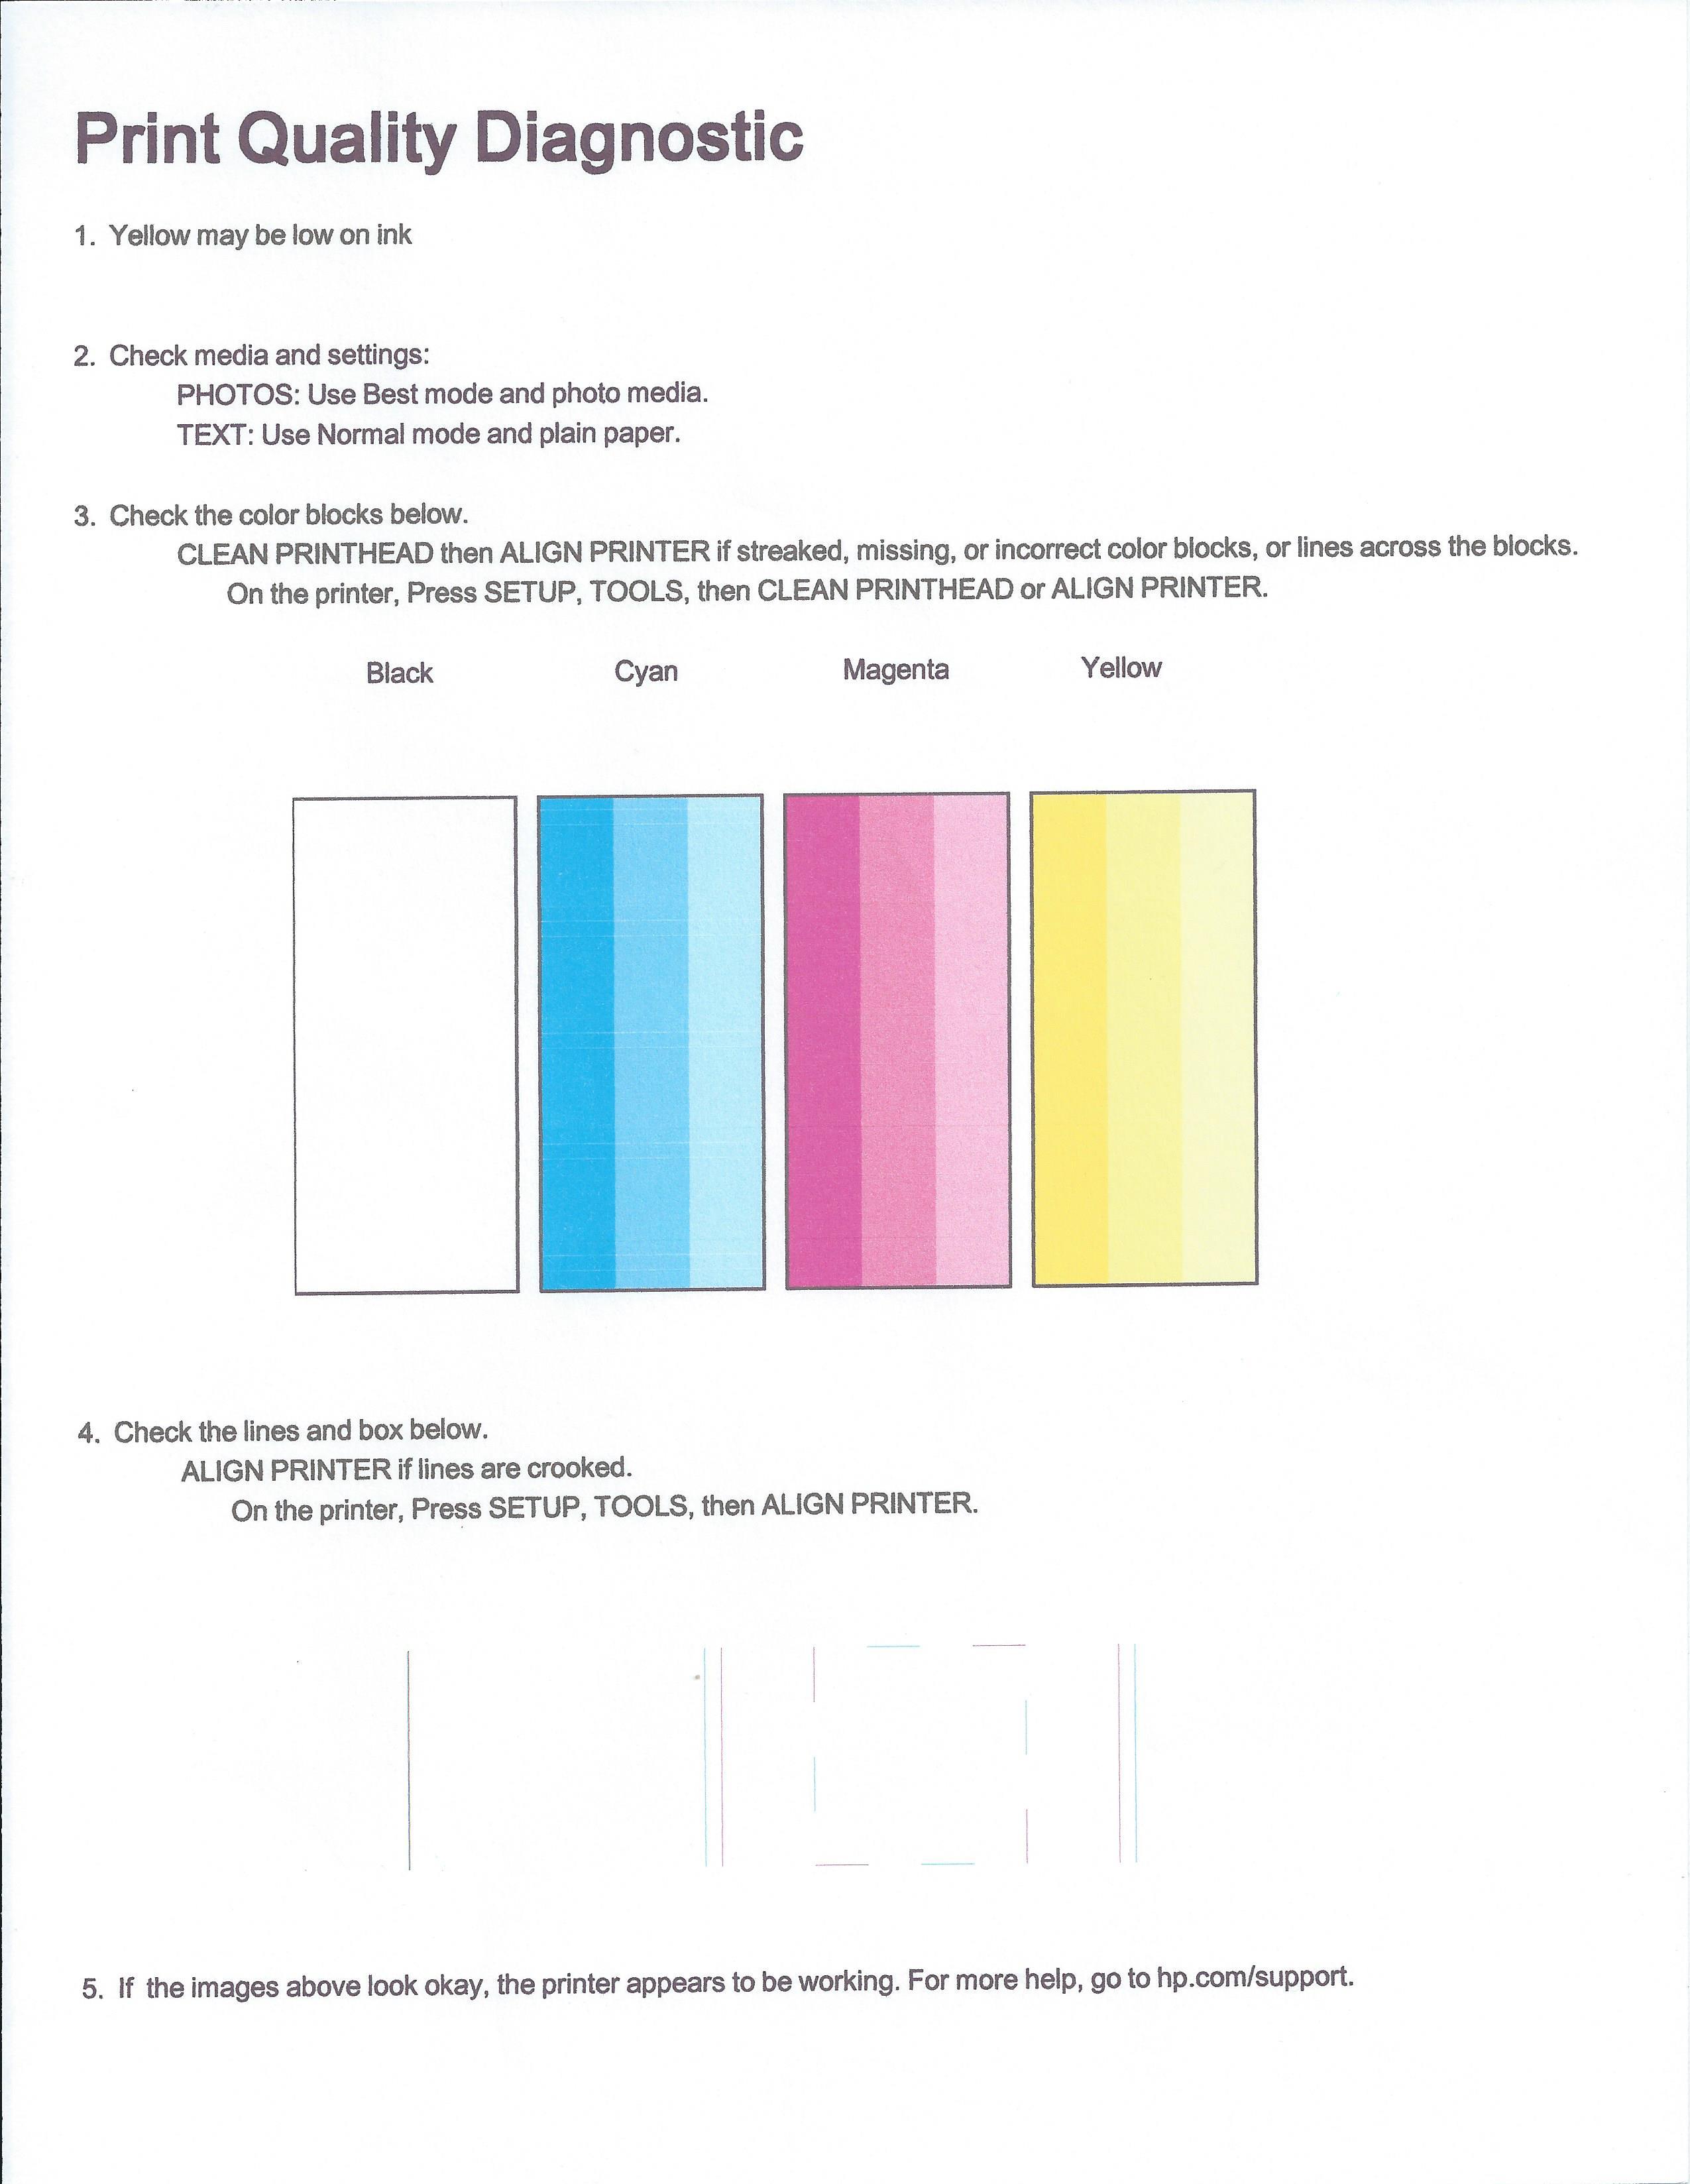 PhotoSmart 6520 Printer not printing black correctly - HP ...